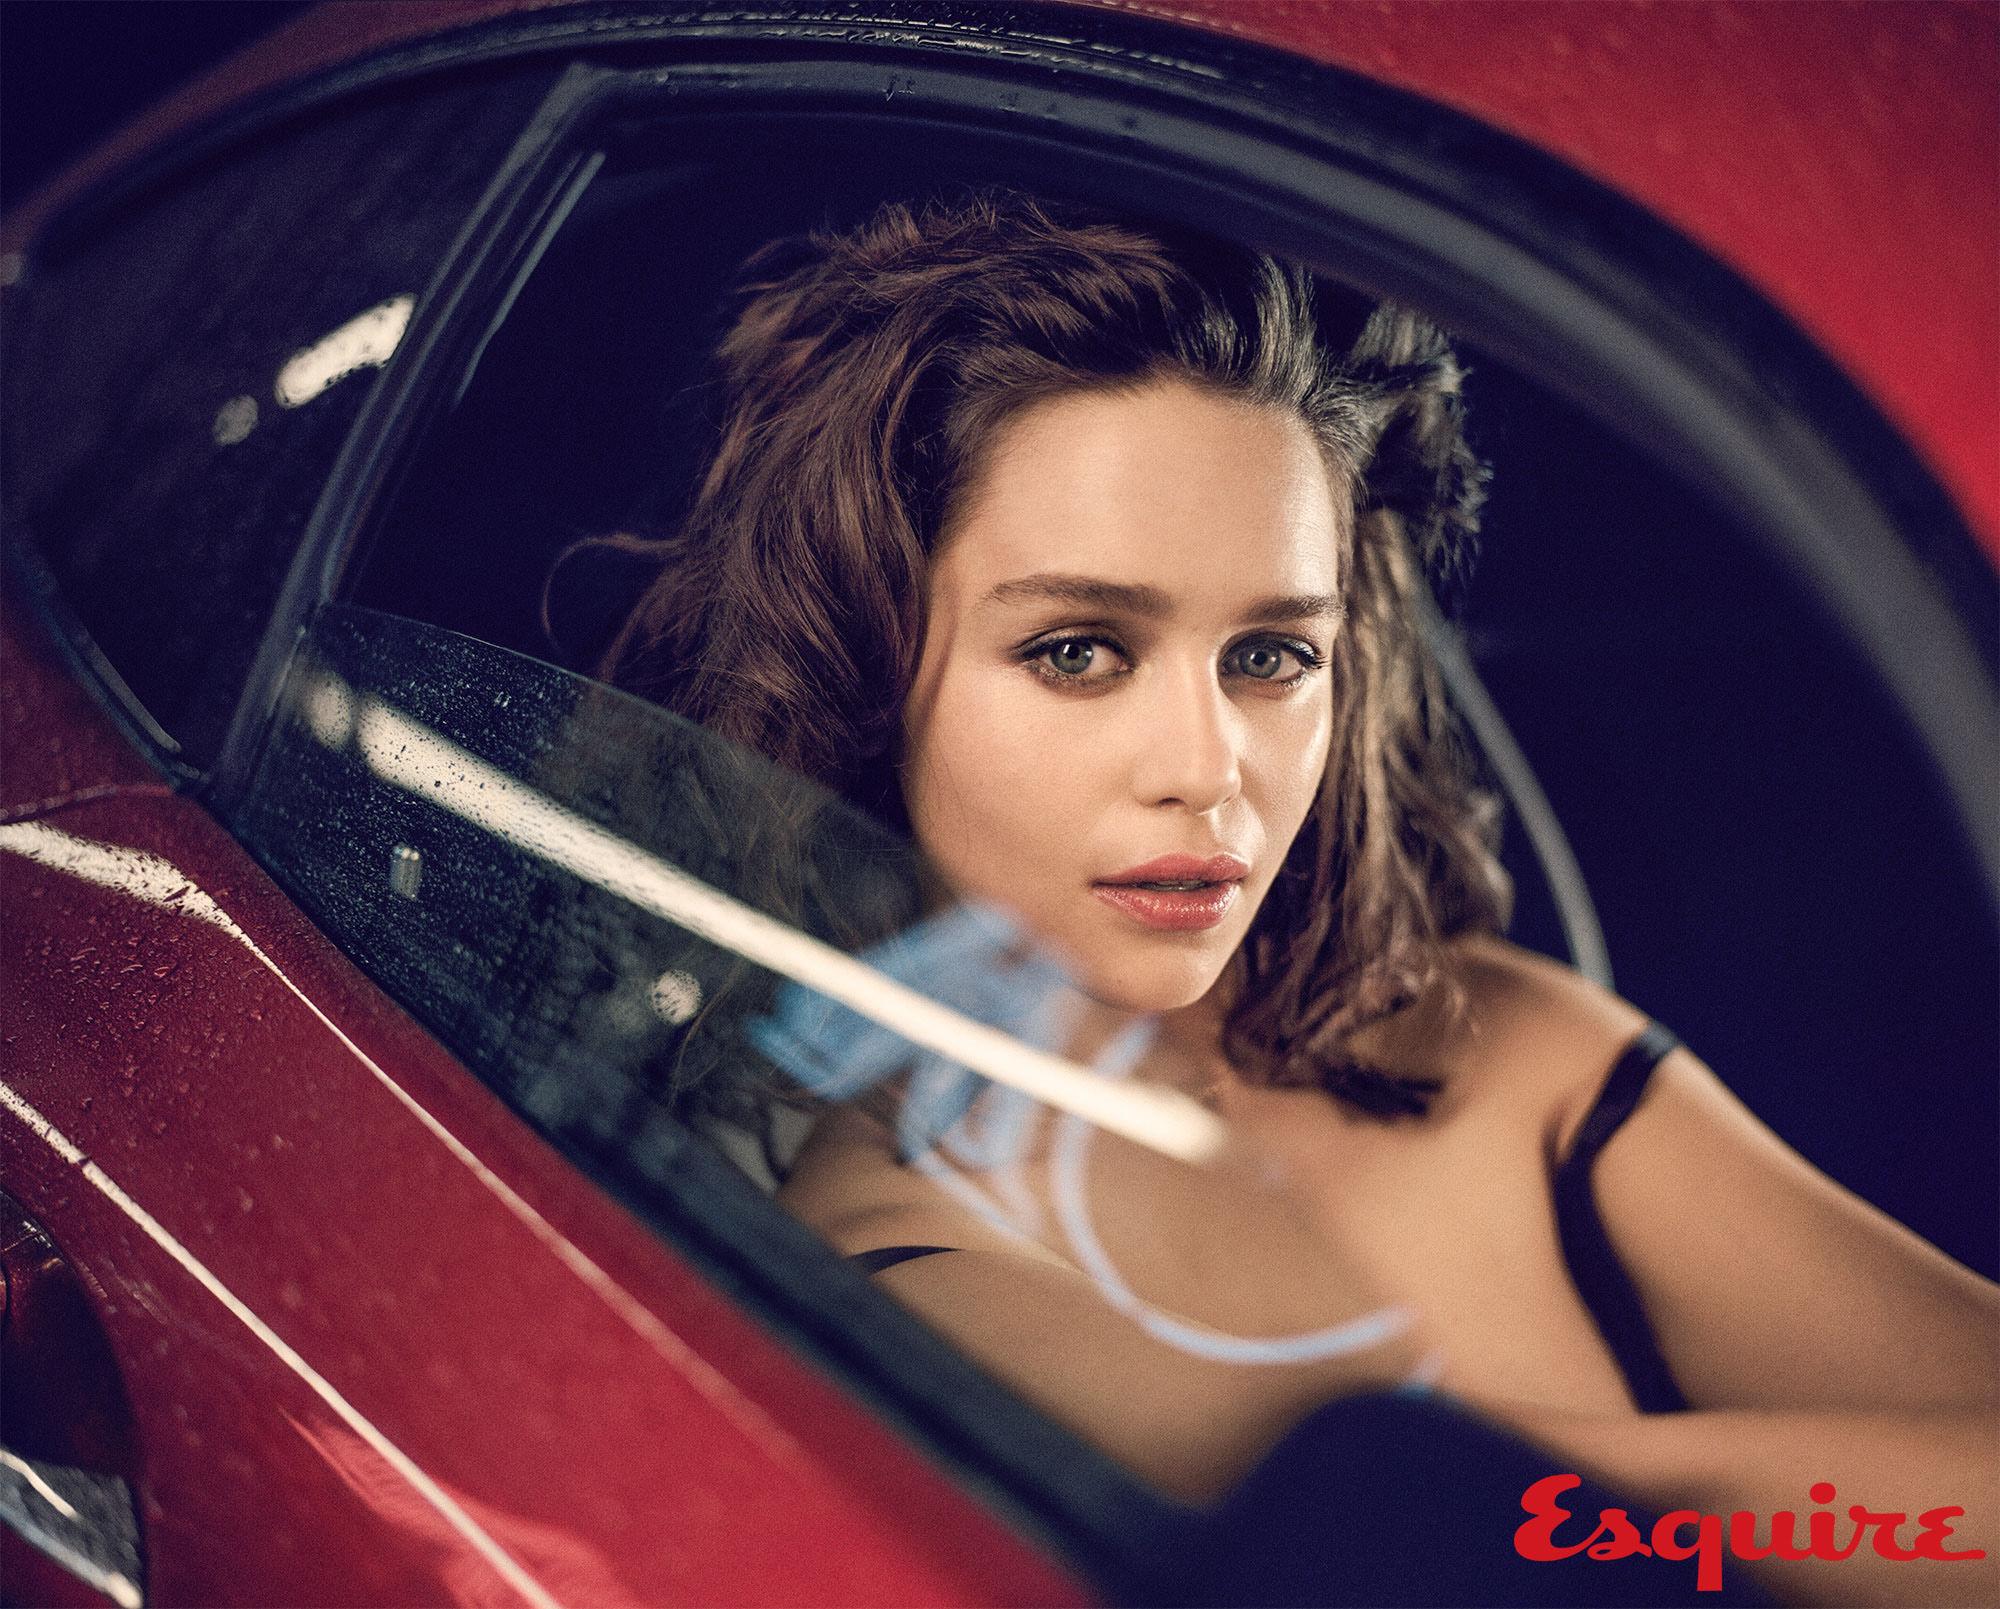 HIGH RES Esquire emilia-clarke-sexiest-woman-alive-2015 11